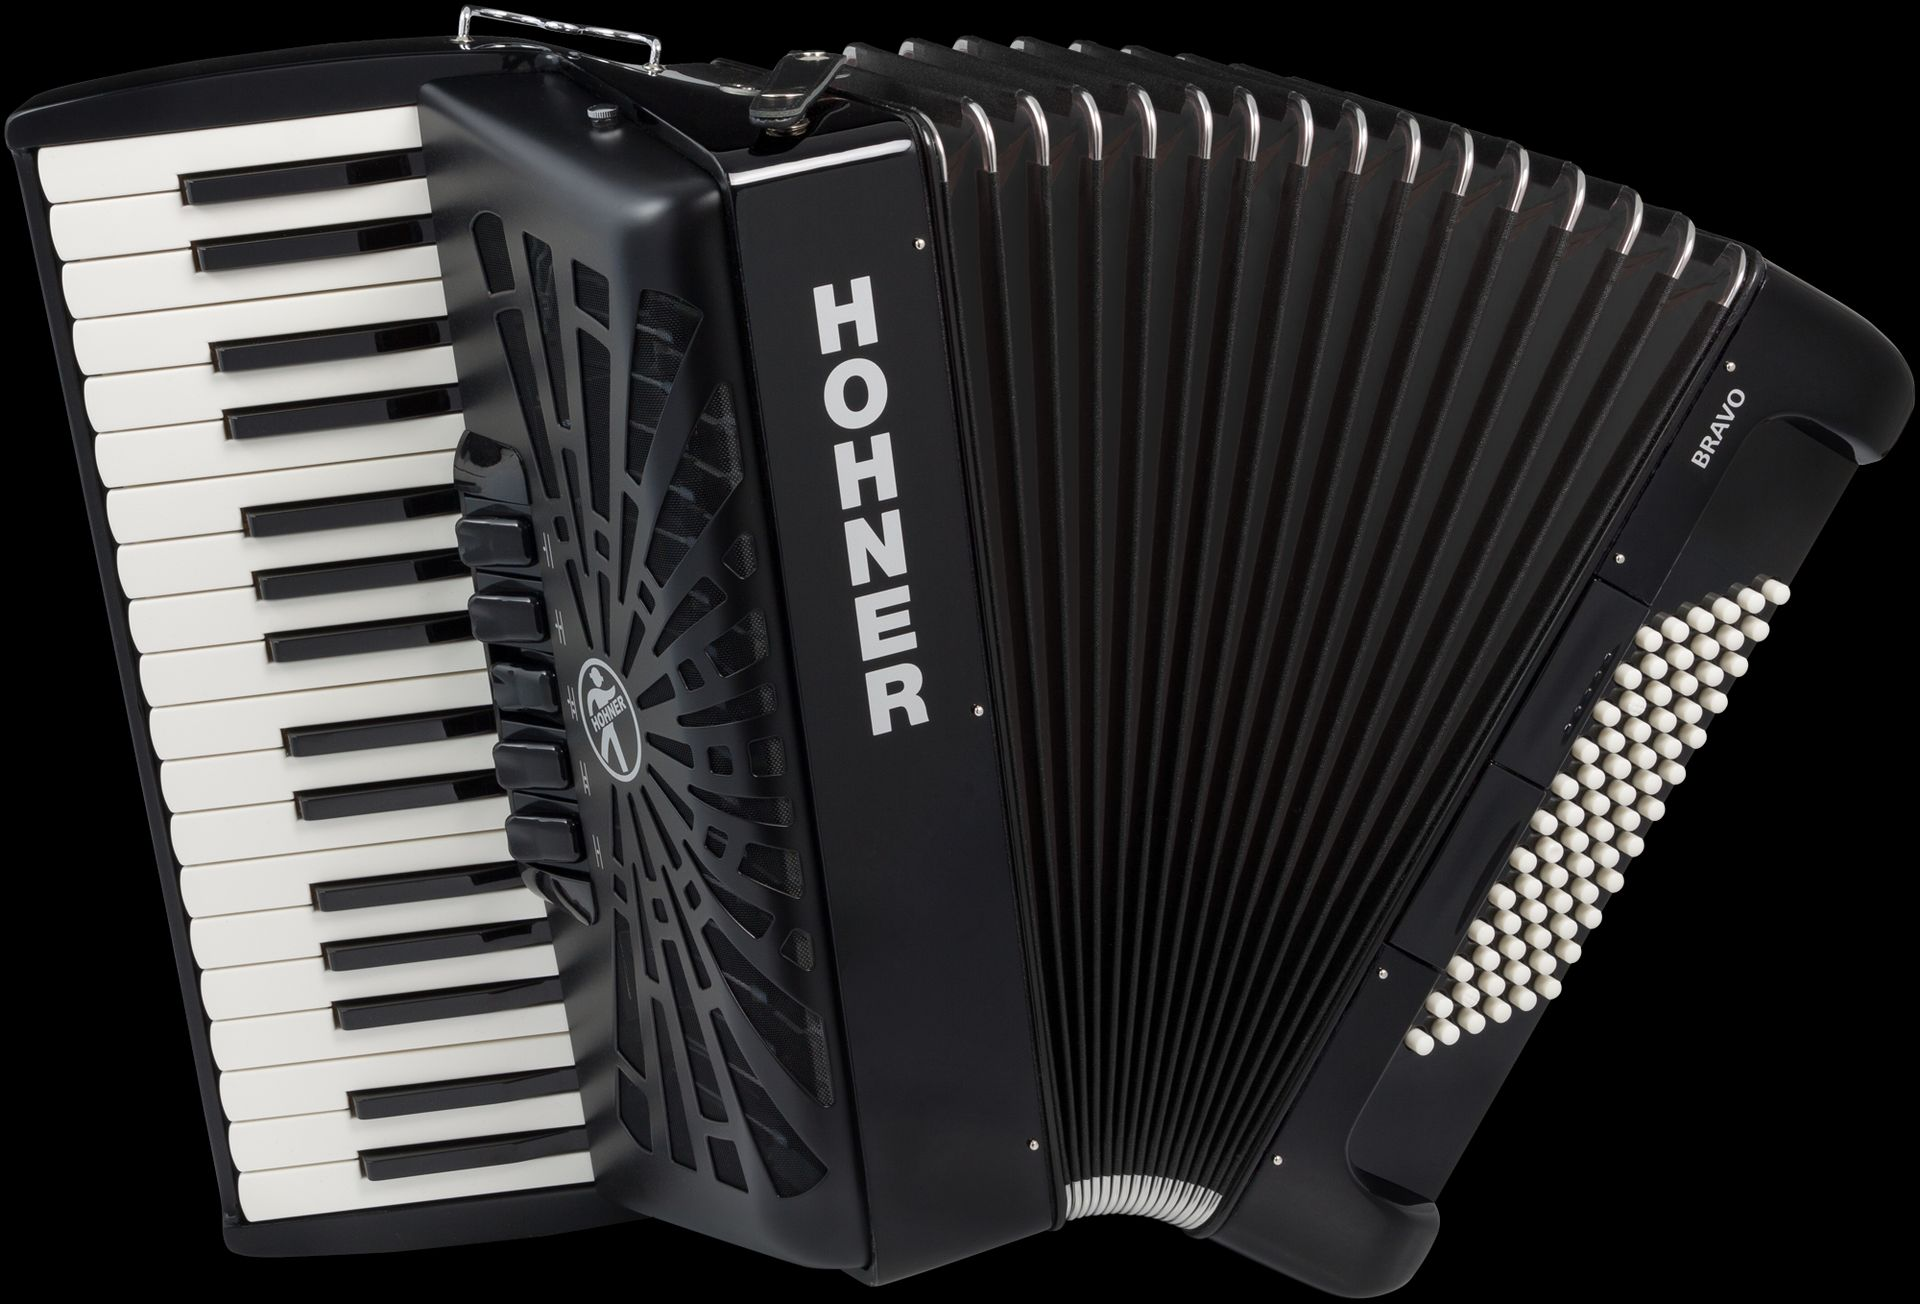 Hohner Bravo III 72 - schwarz  HOA16622  72 Bässe, Silent Key